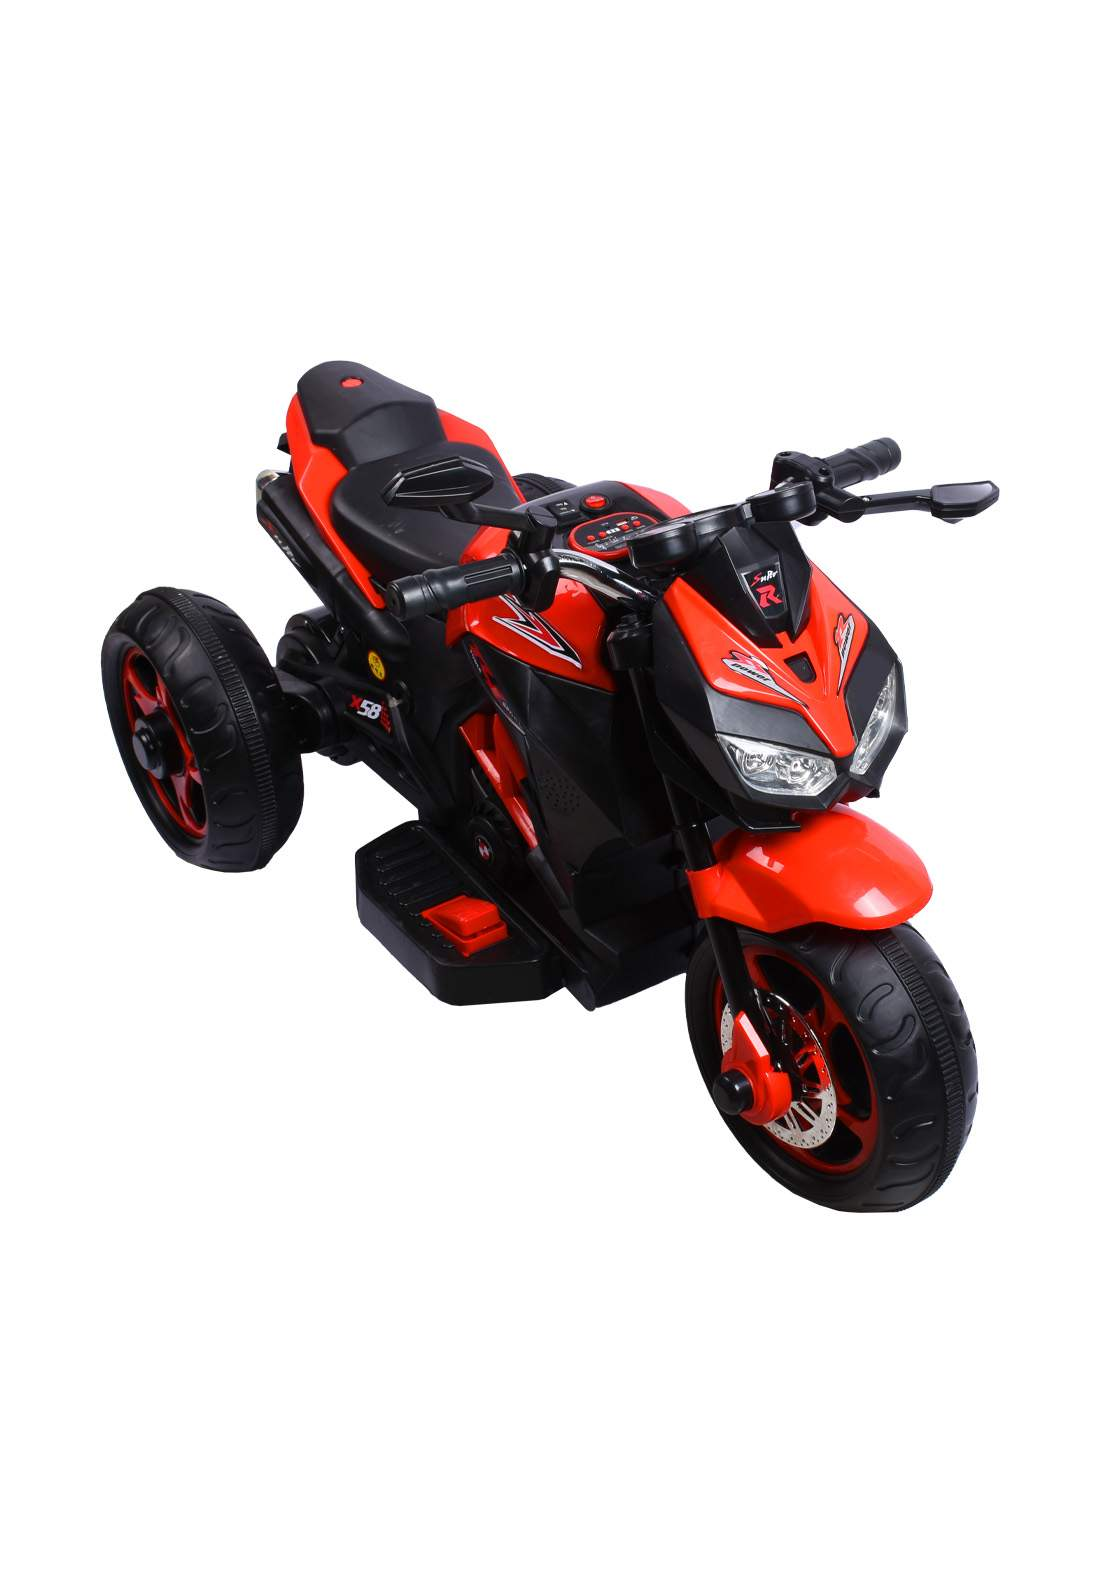 Electric bike for children with 3 wheels-Red دراجة للاطفال